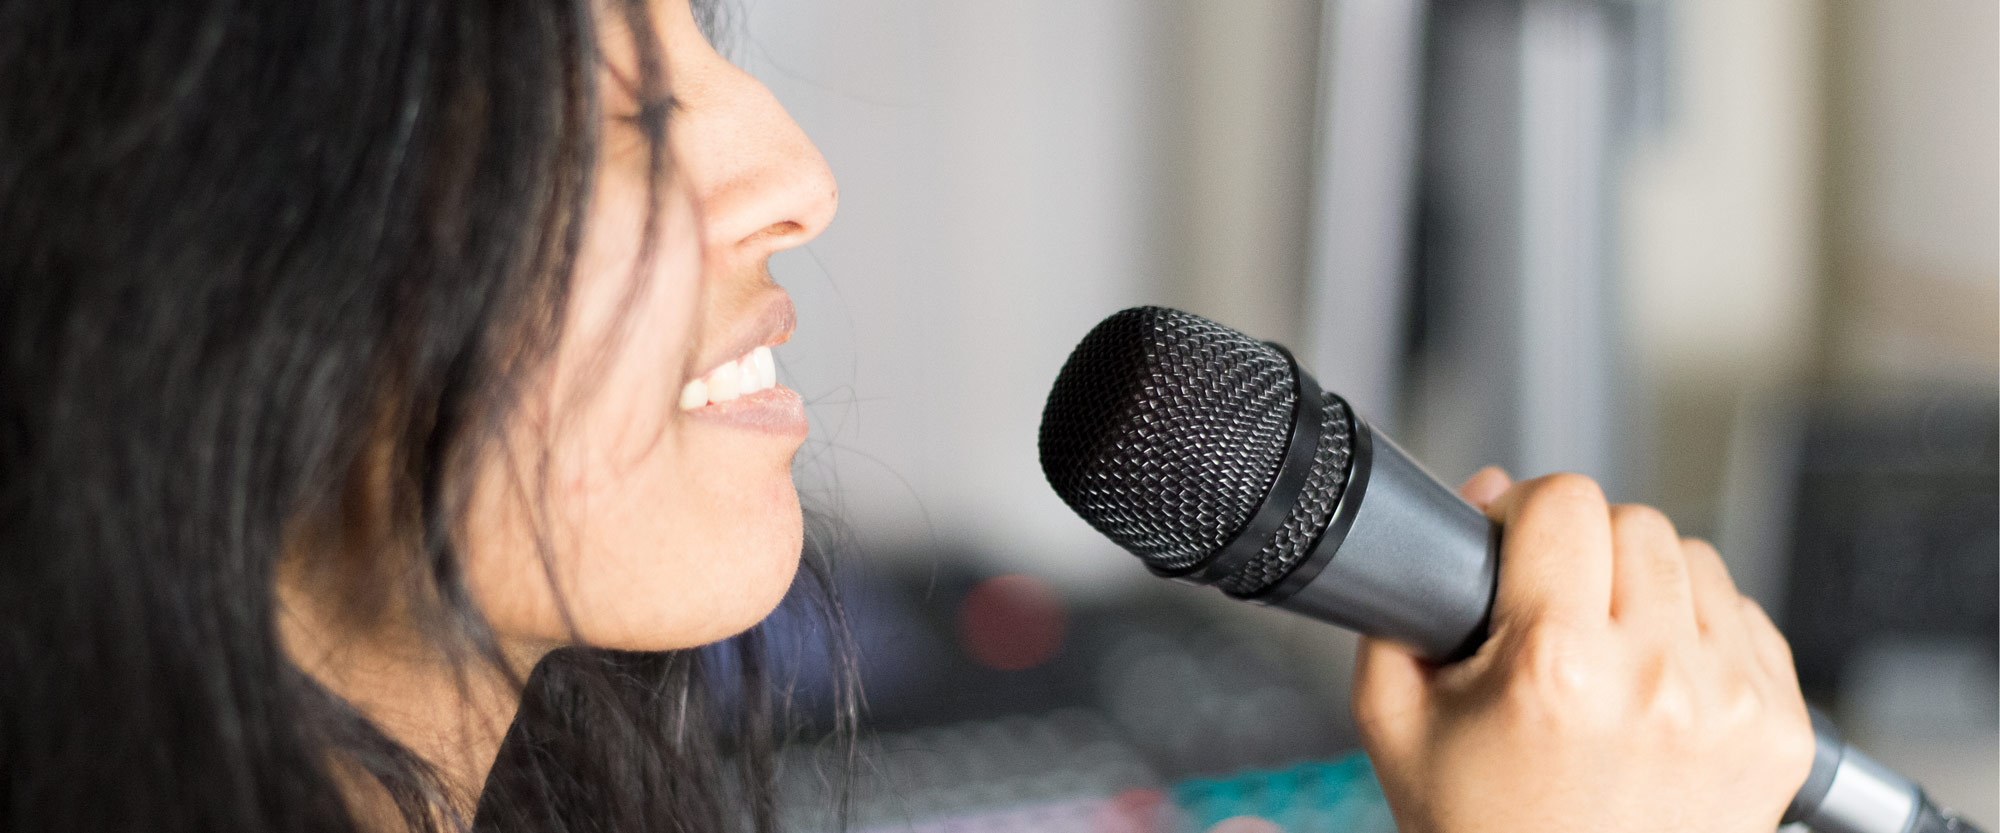 Onlinekurs Mikrofonteknik